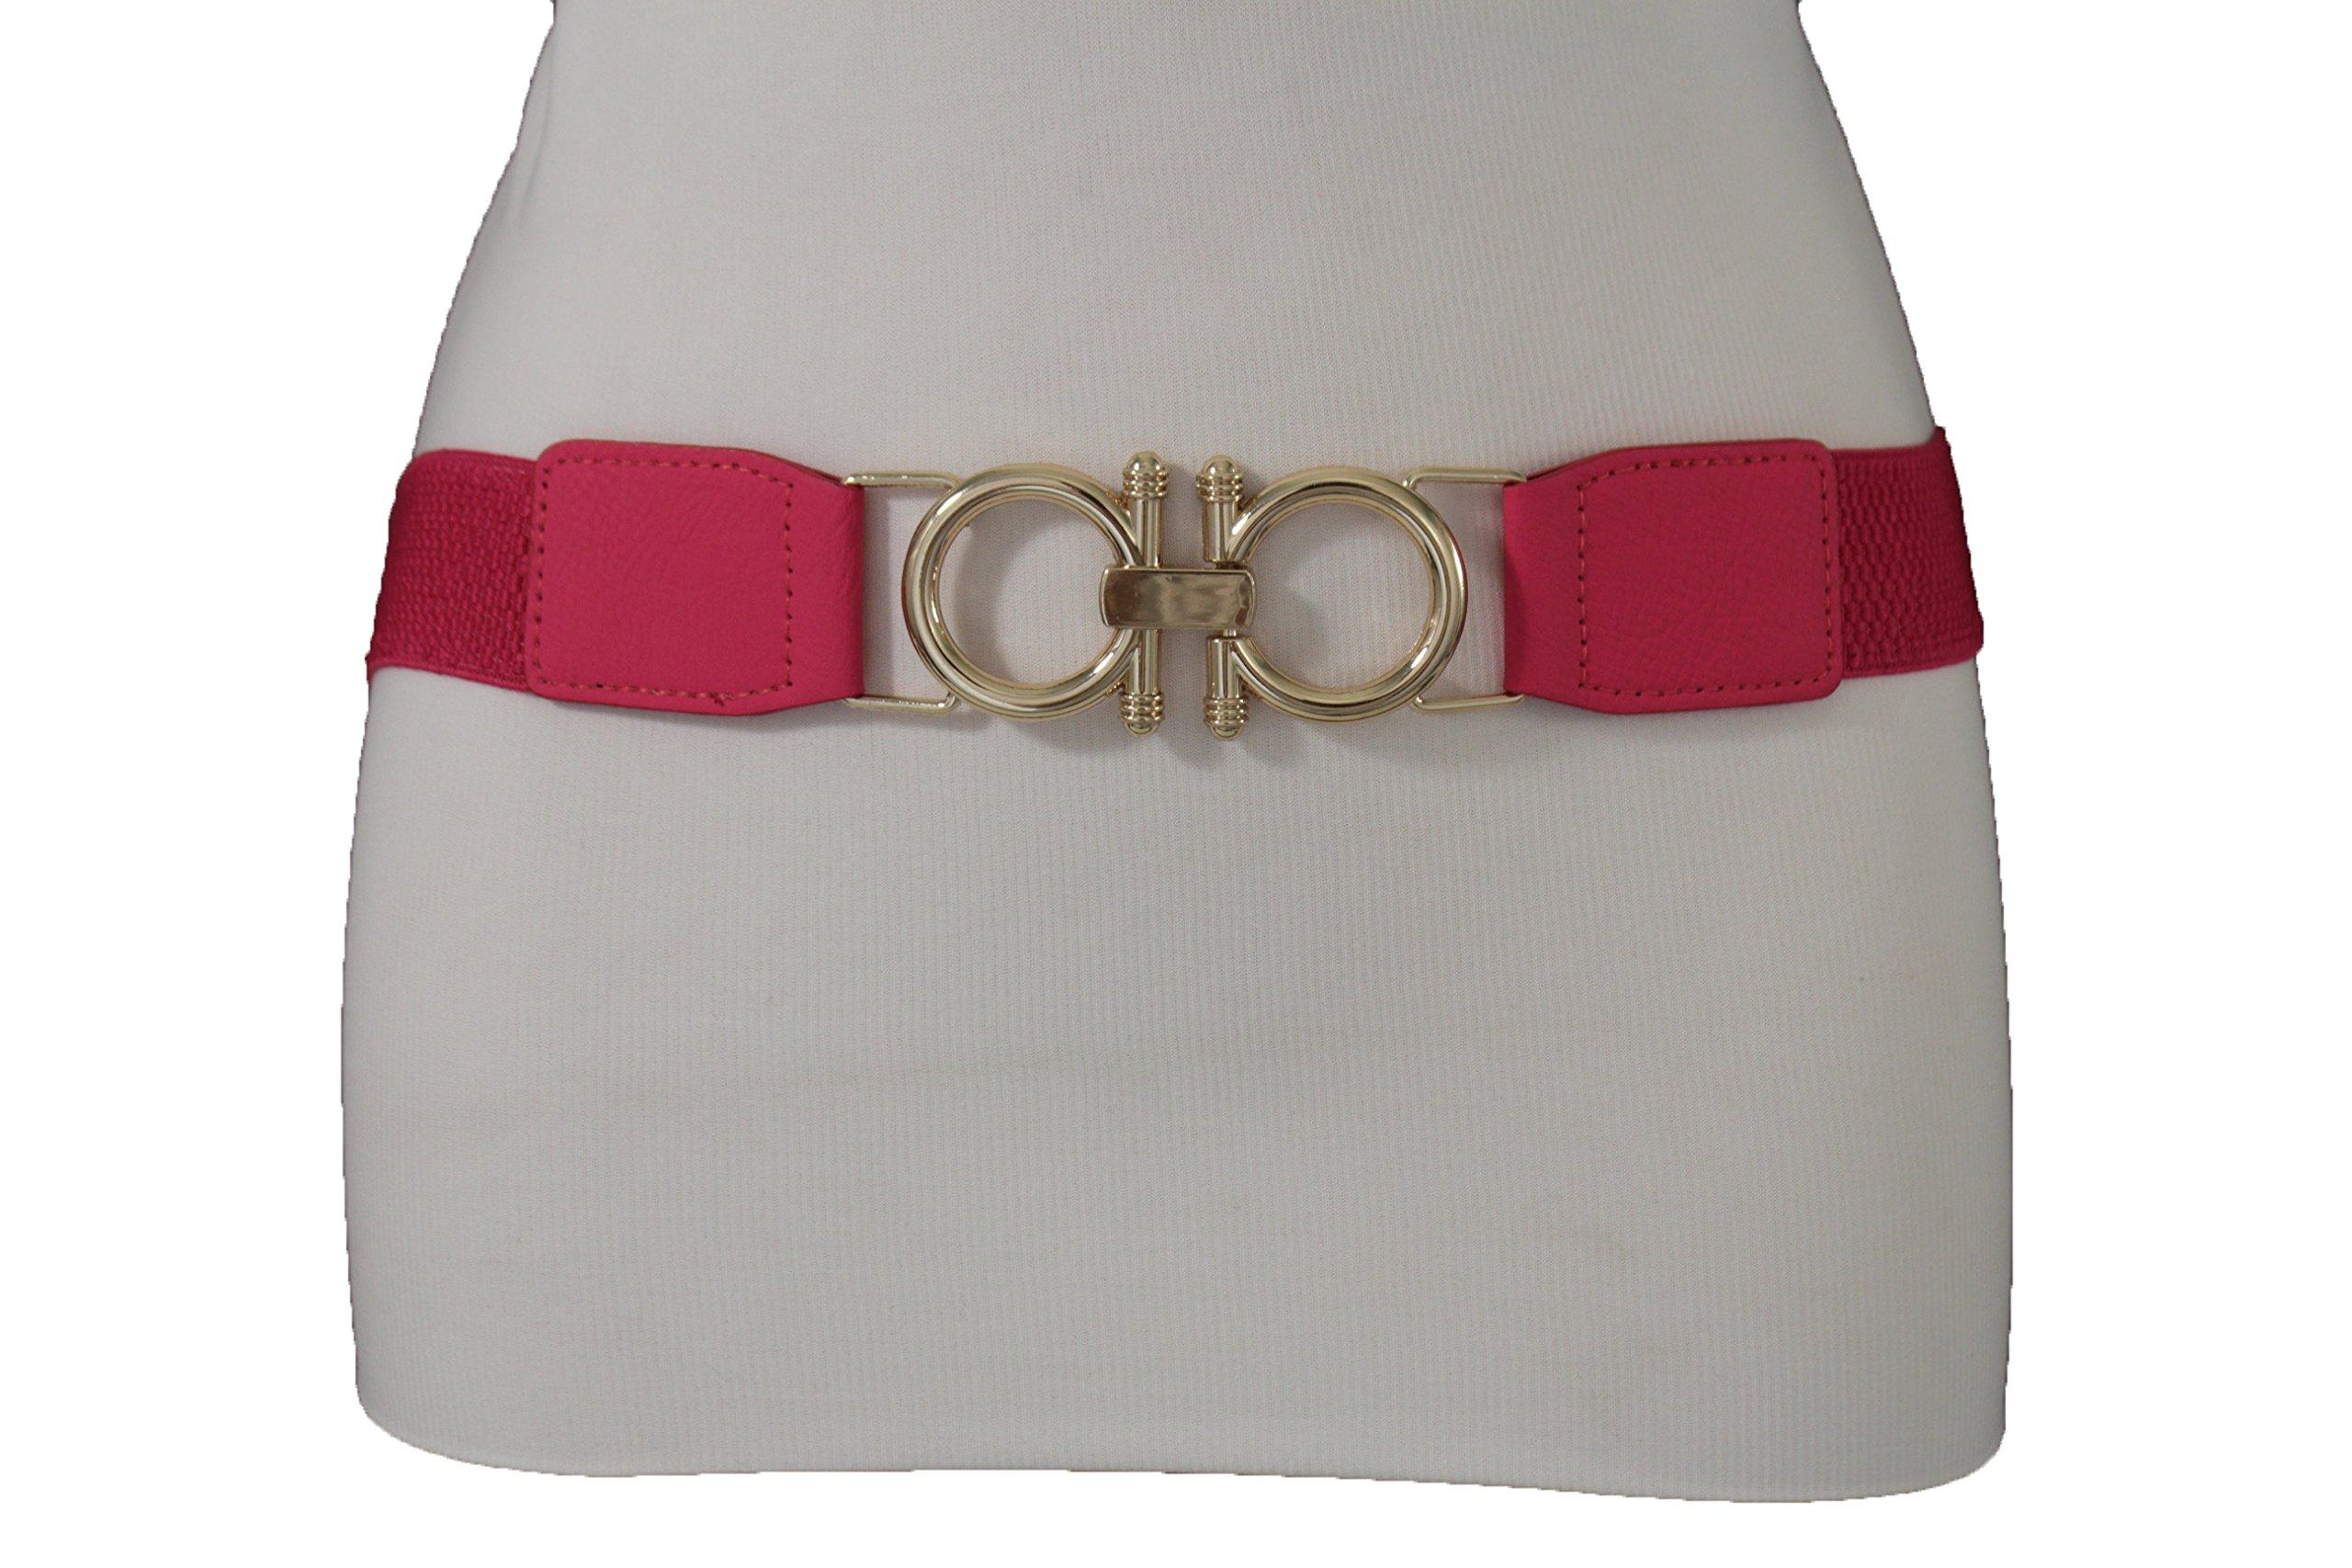 TFJ Women Elastic Fashion Belt Hip High Waist Gold Buckle Elastic Plus M L XL Pink